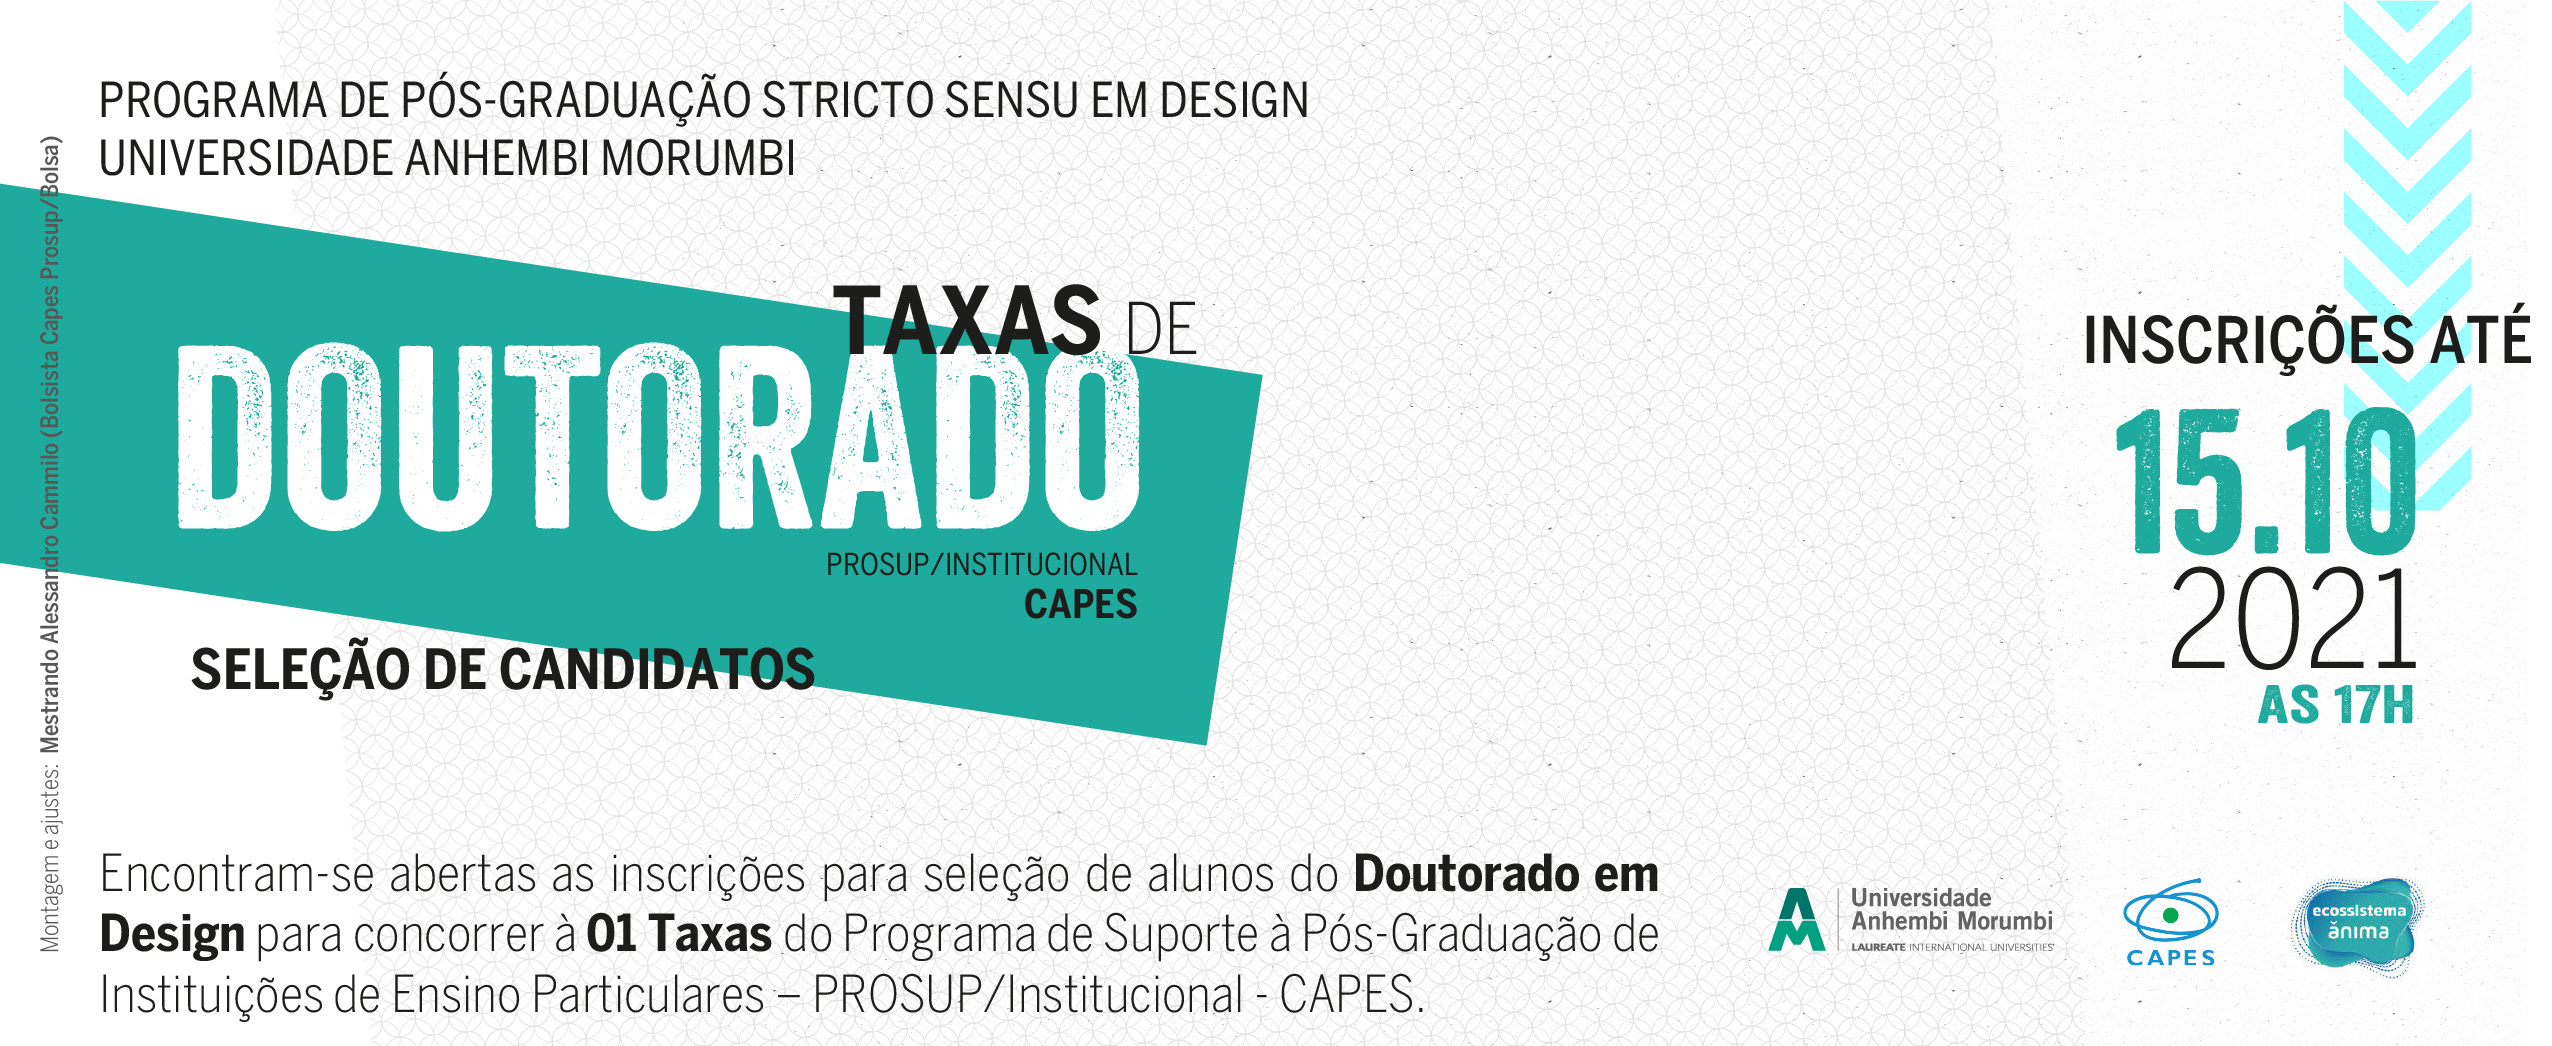 Banner Doutorado Taxa